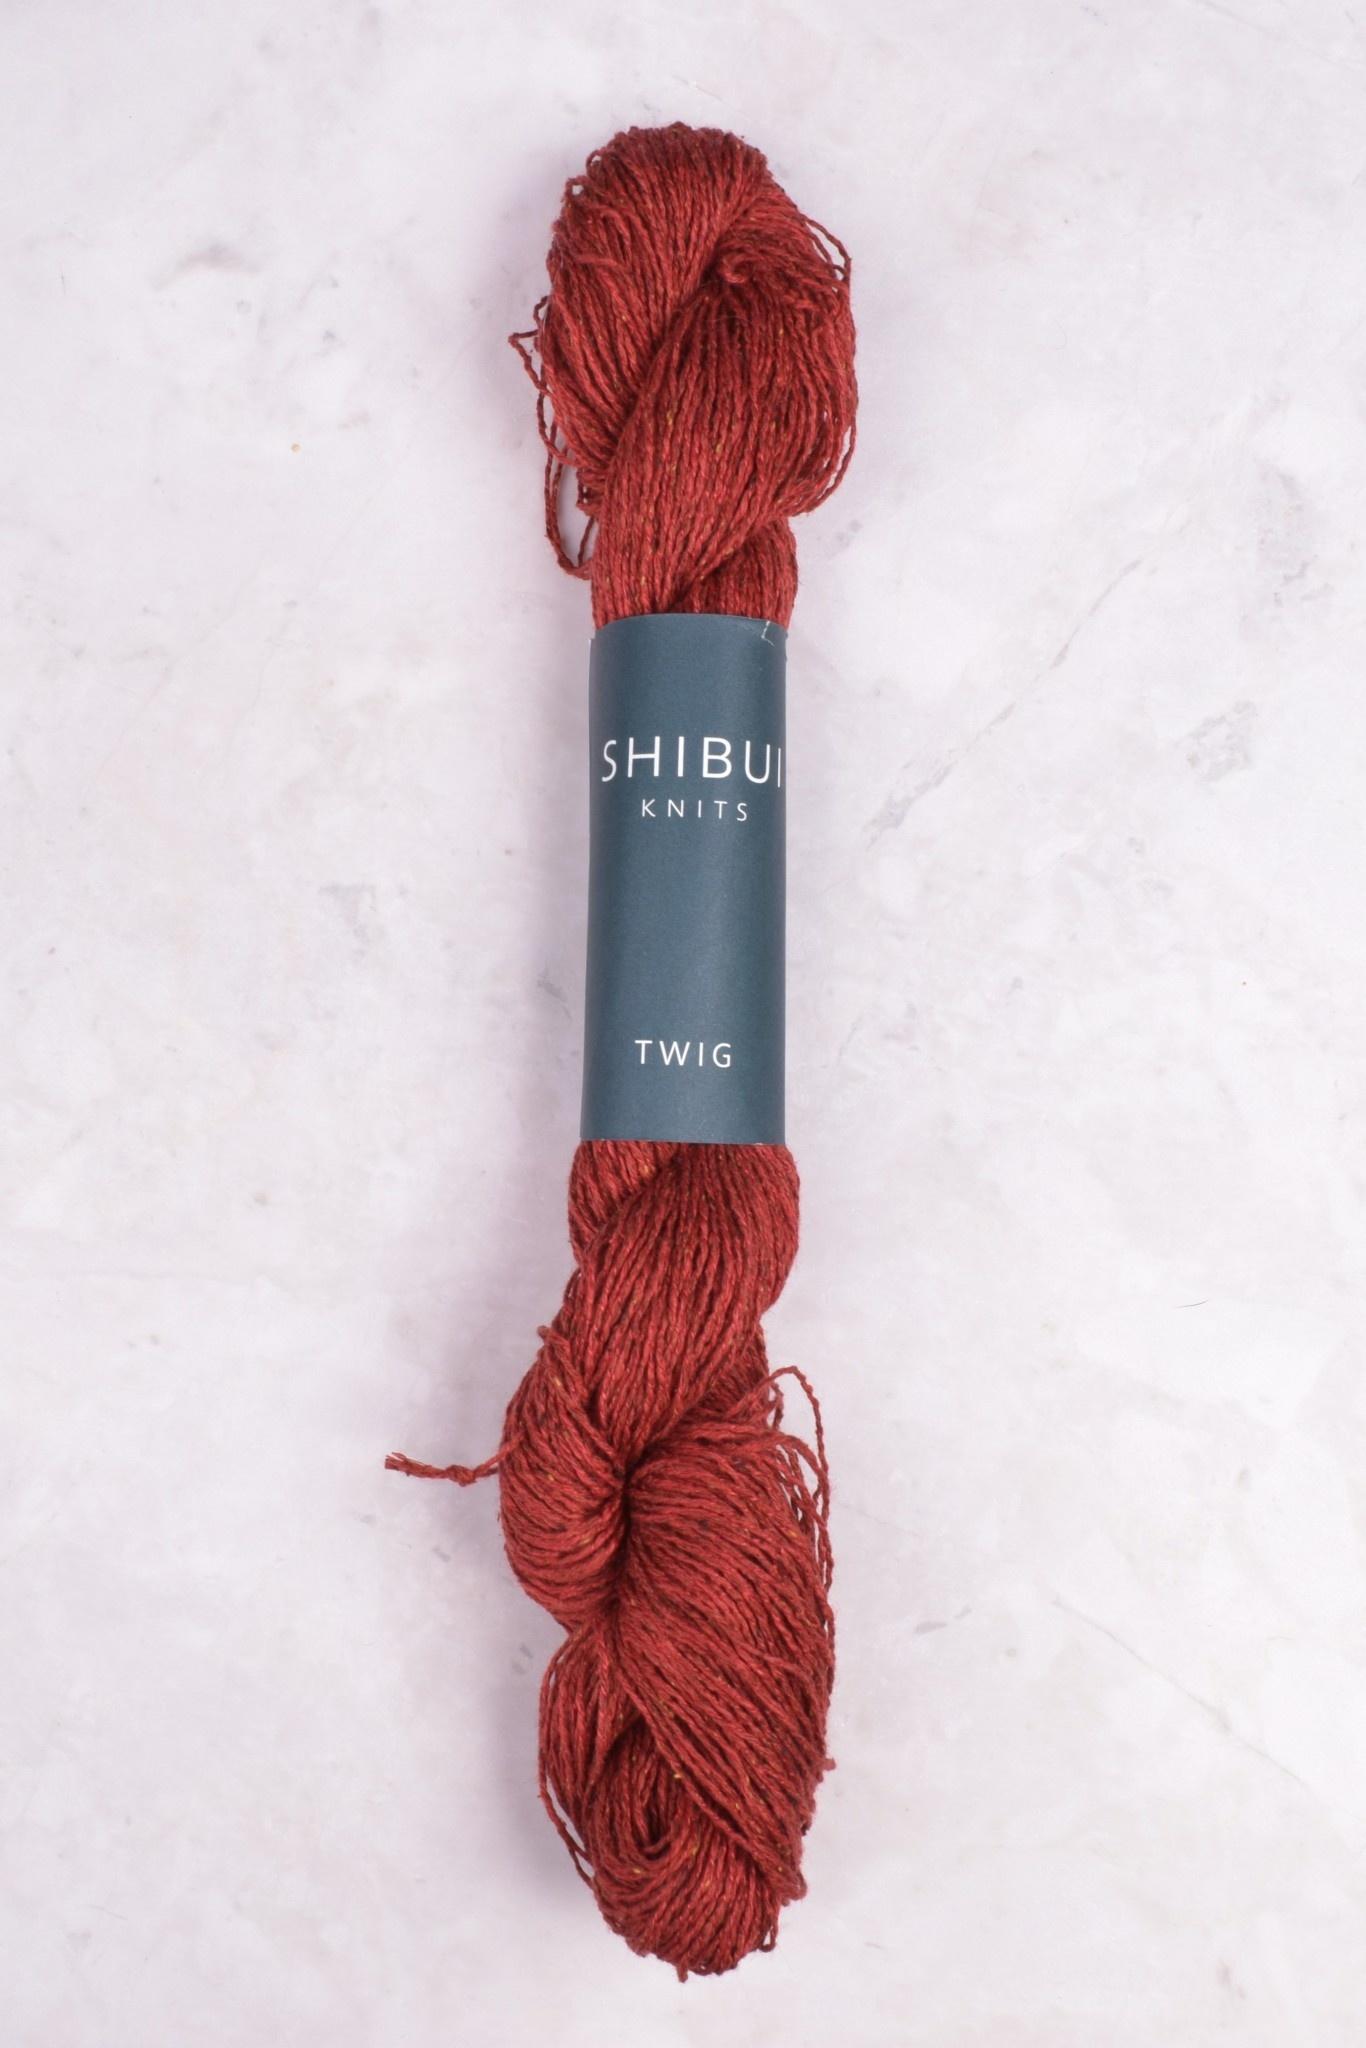 Image of Shibui Twig 115 Brick (Discontinued)